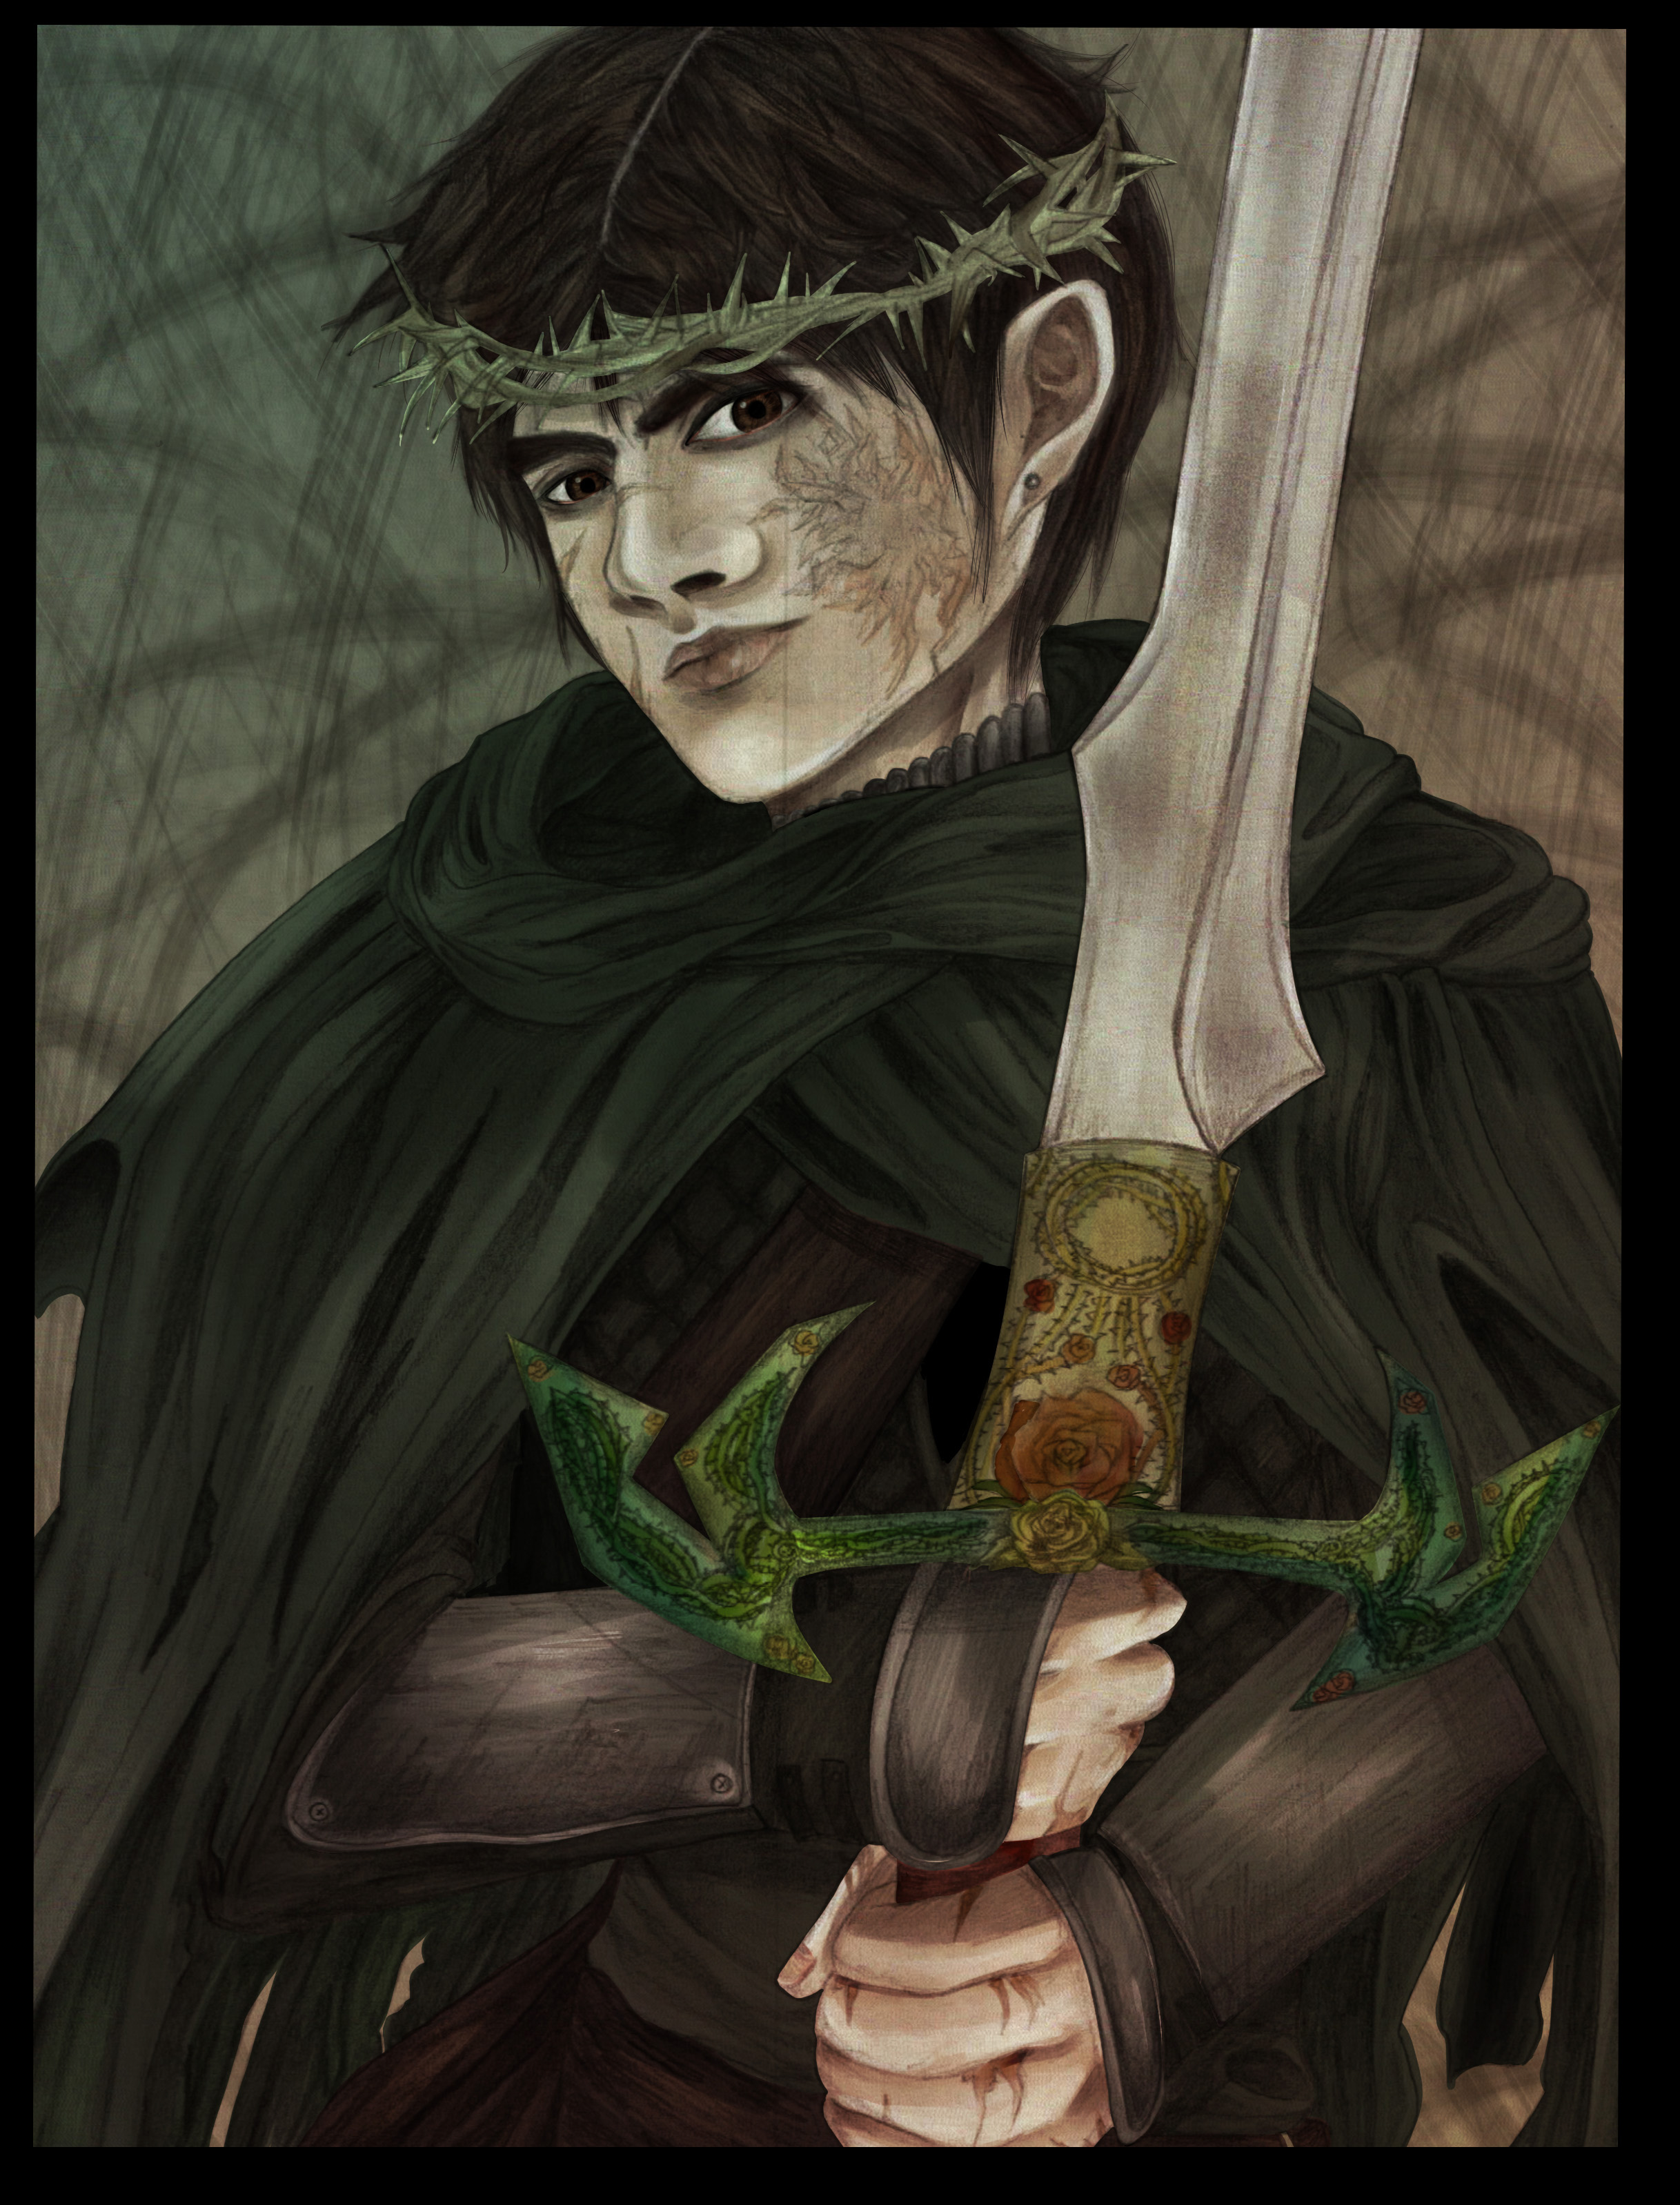 Prince Honorous Jorg Ancrath